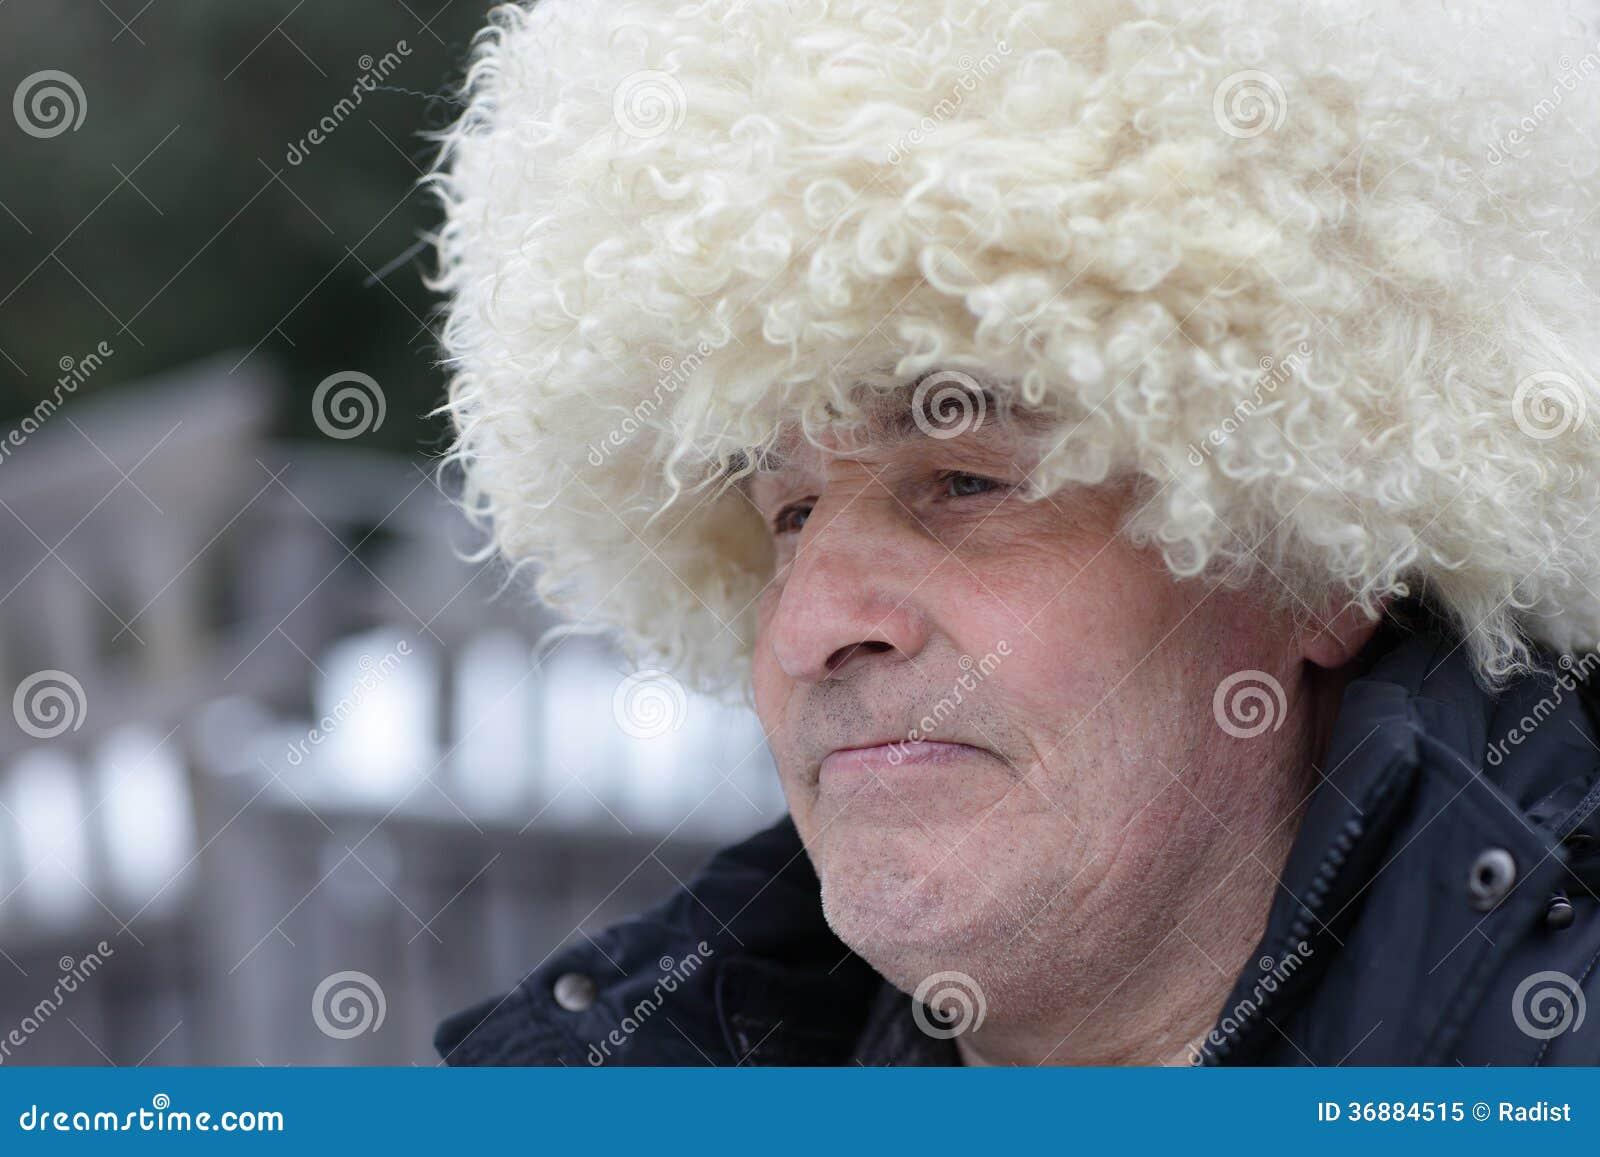 Download Uomo in cappello caucasico immagine stock. Immagine di caucasico - 36884515